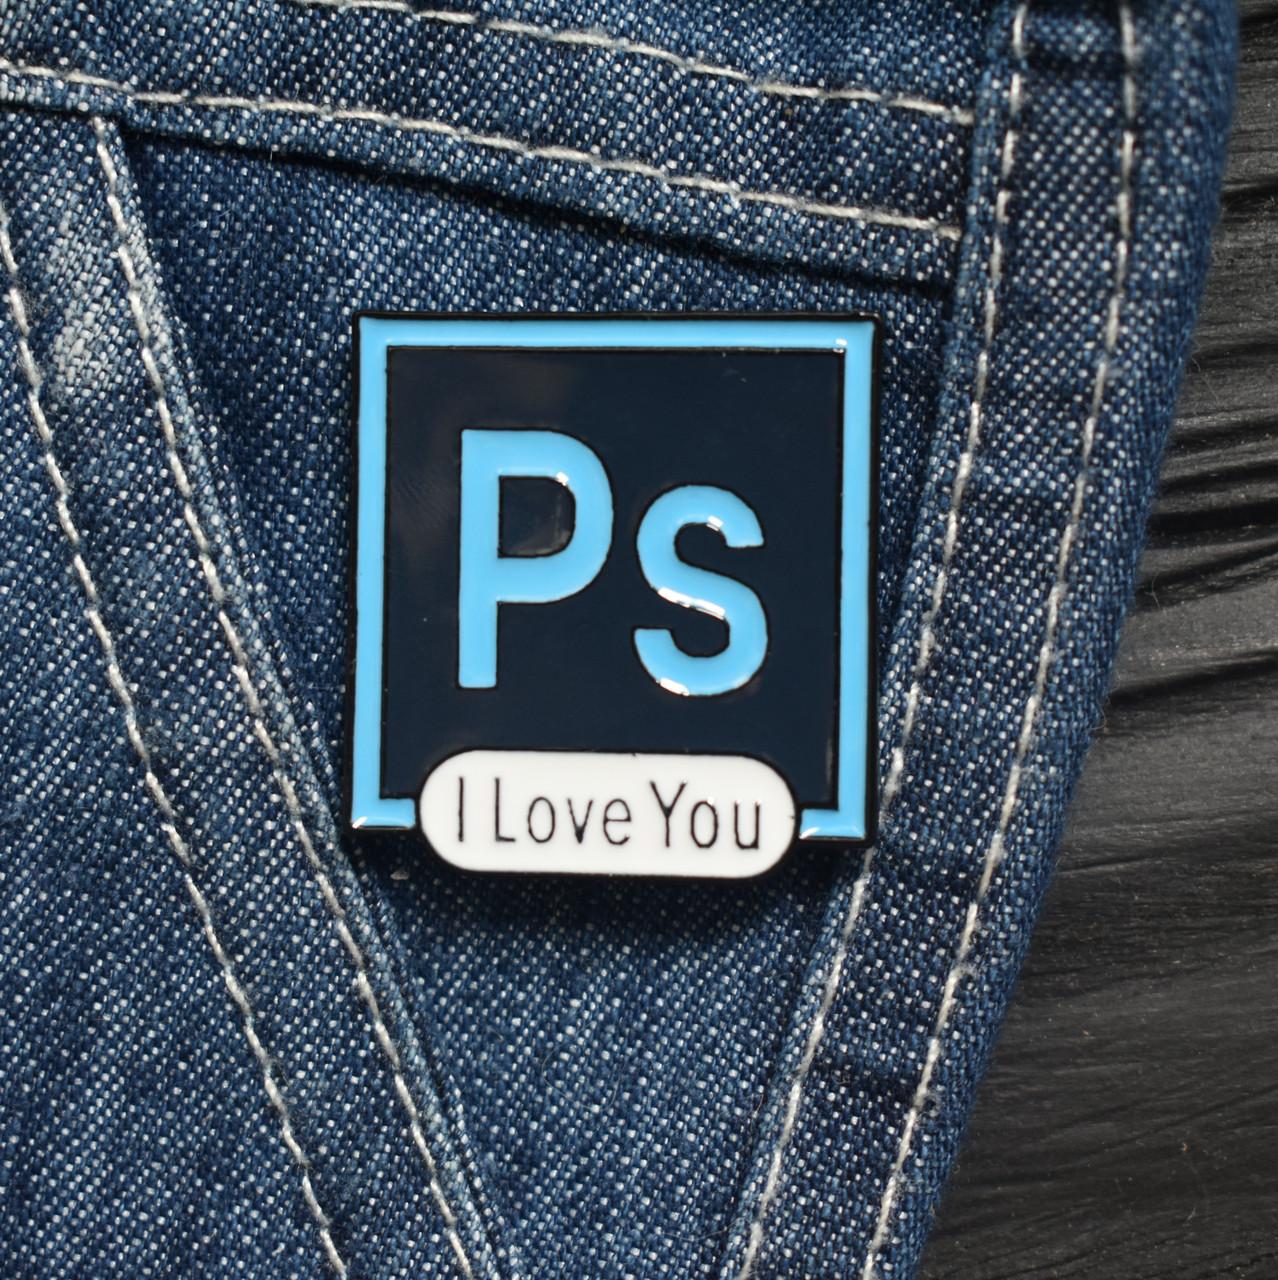 "Значок, брошь-значок, пин из металла на одежду, металлический значок ""Photoshop. I love you"""